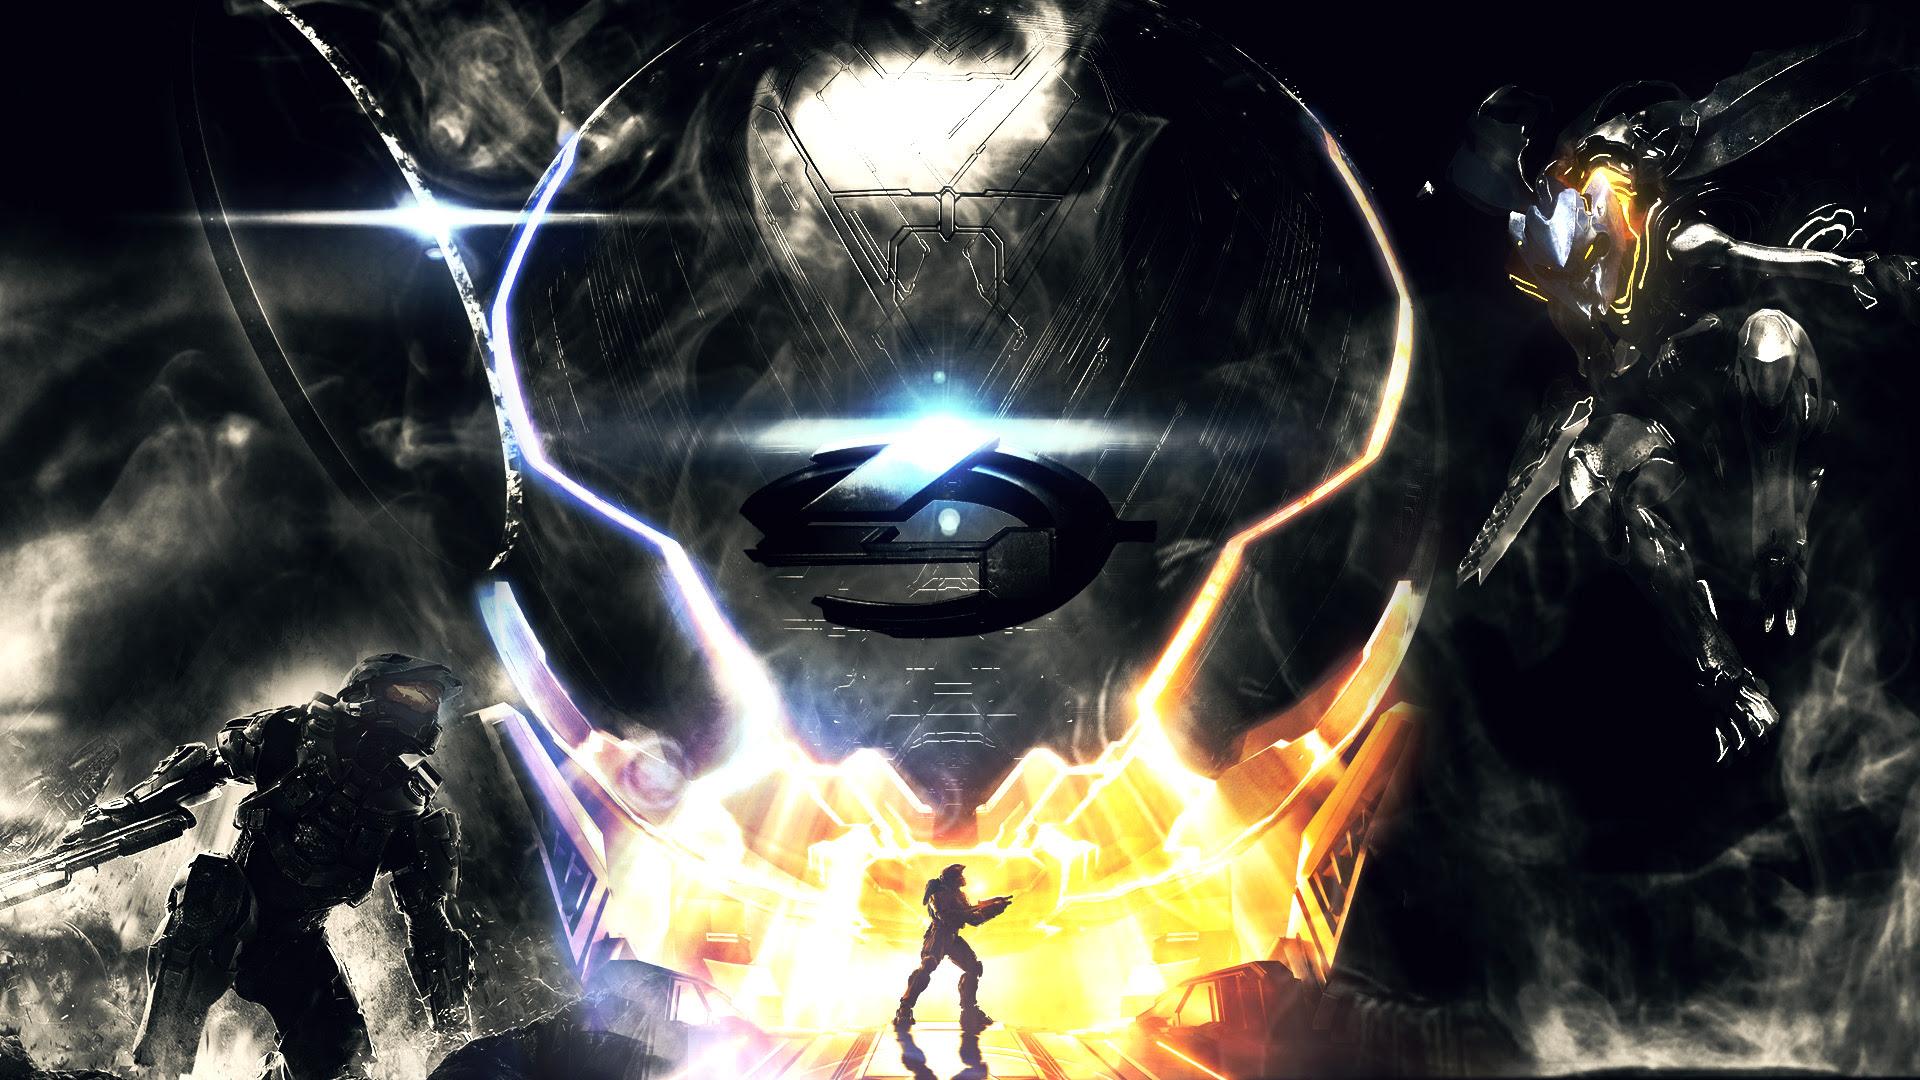 Halo 4 Wallpaper 8